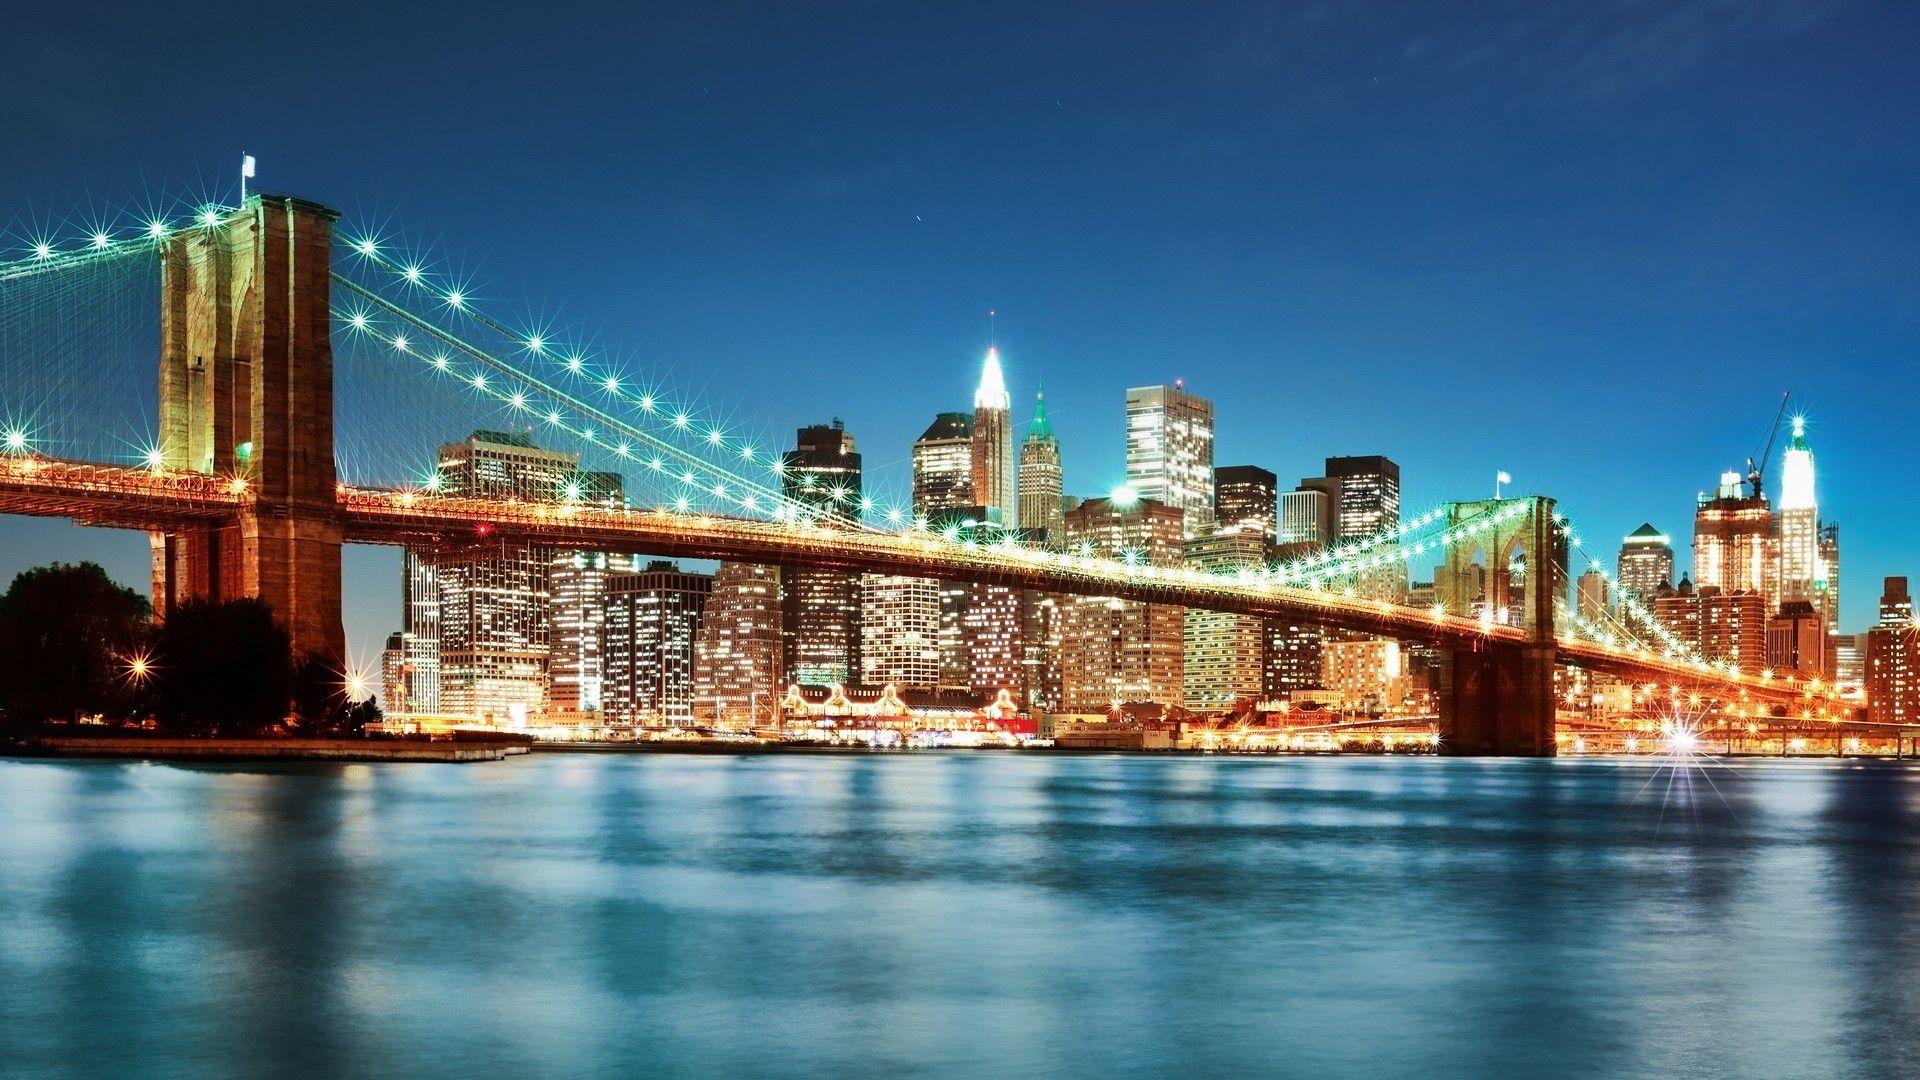 New York Brooklyn Bridge Google Search Visit New York Brooklyn Bridge New York New York Wallpaper